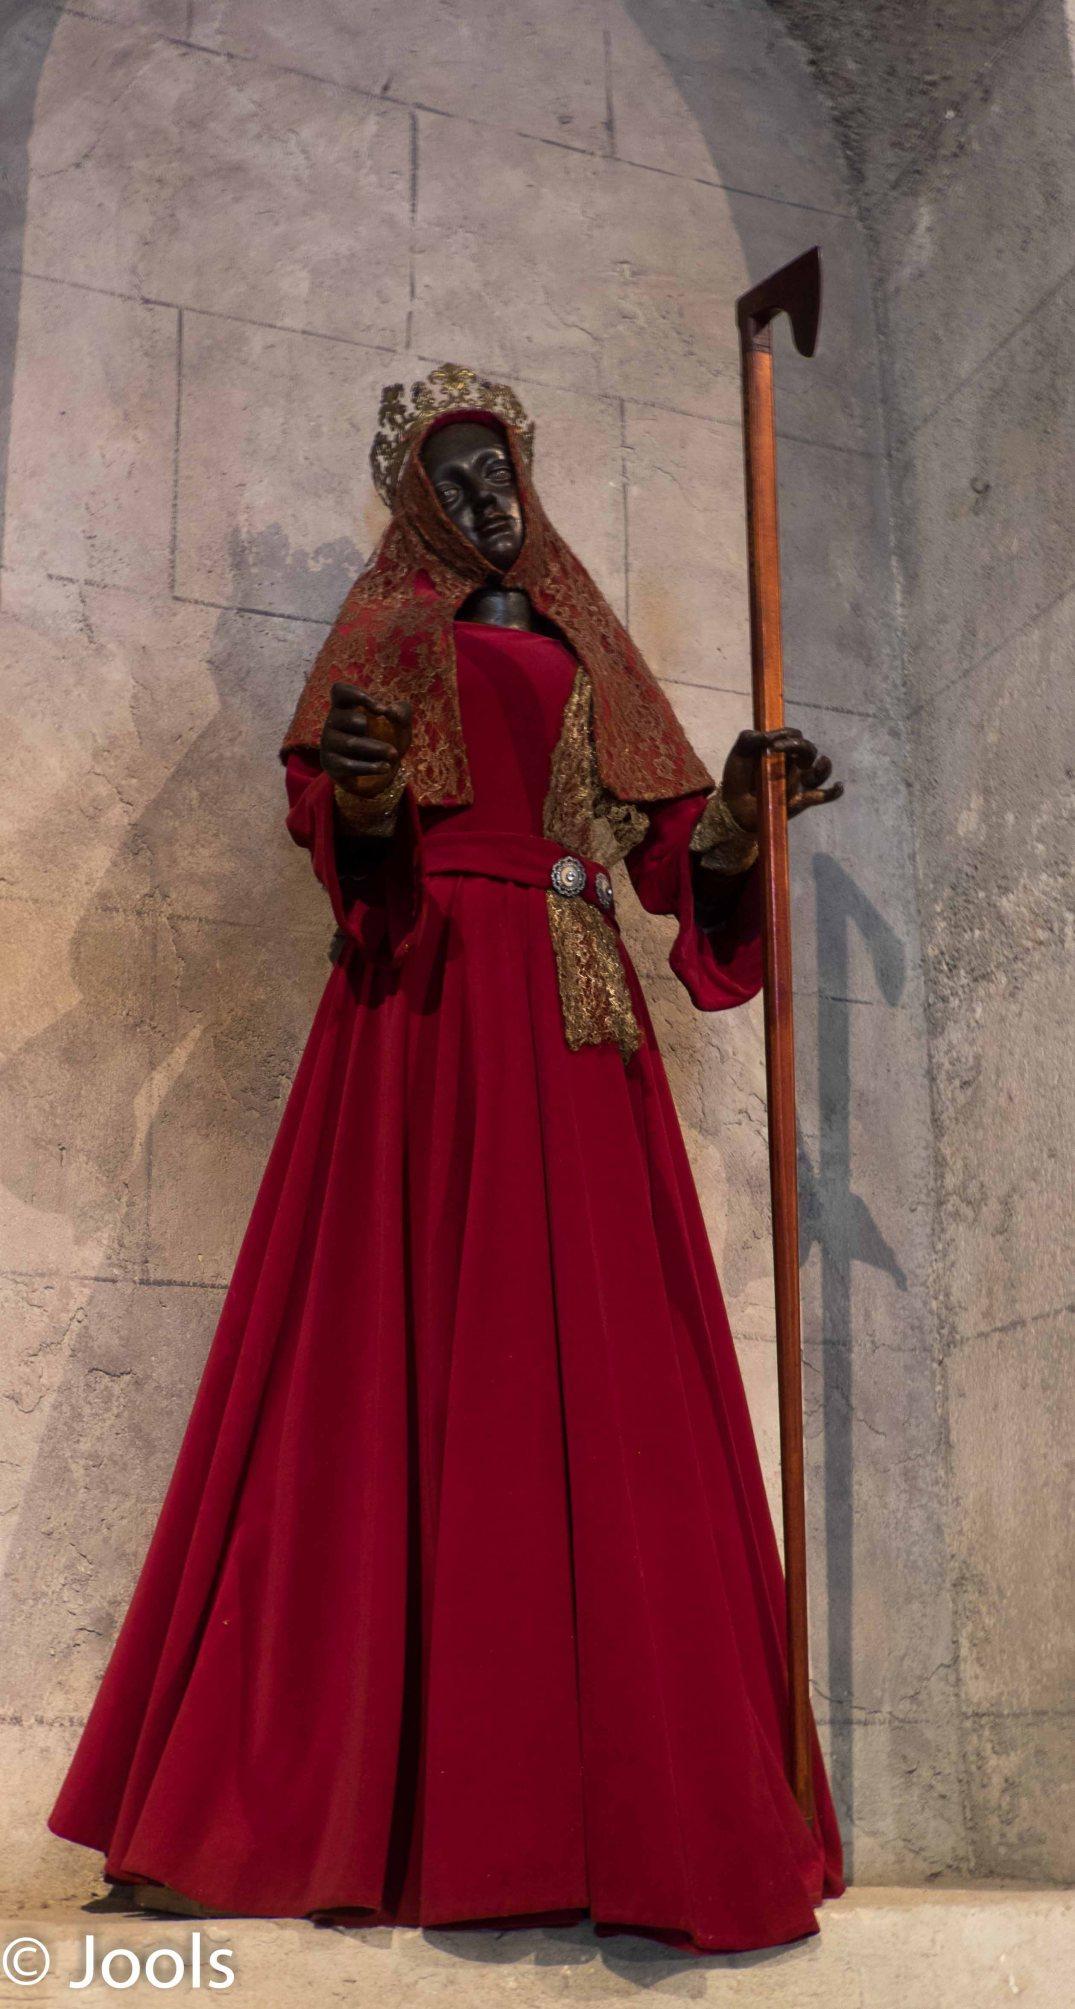 Dressed Statue Havanna-2 lowres